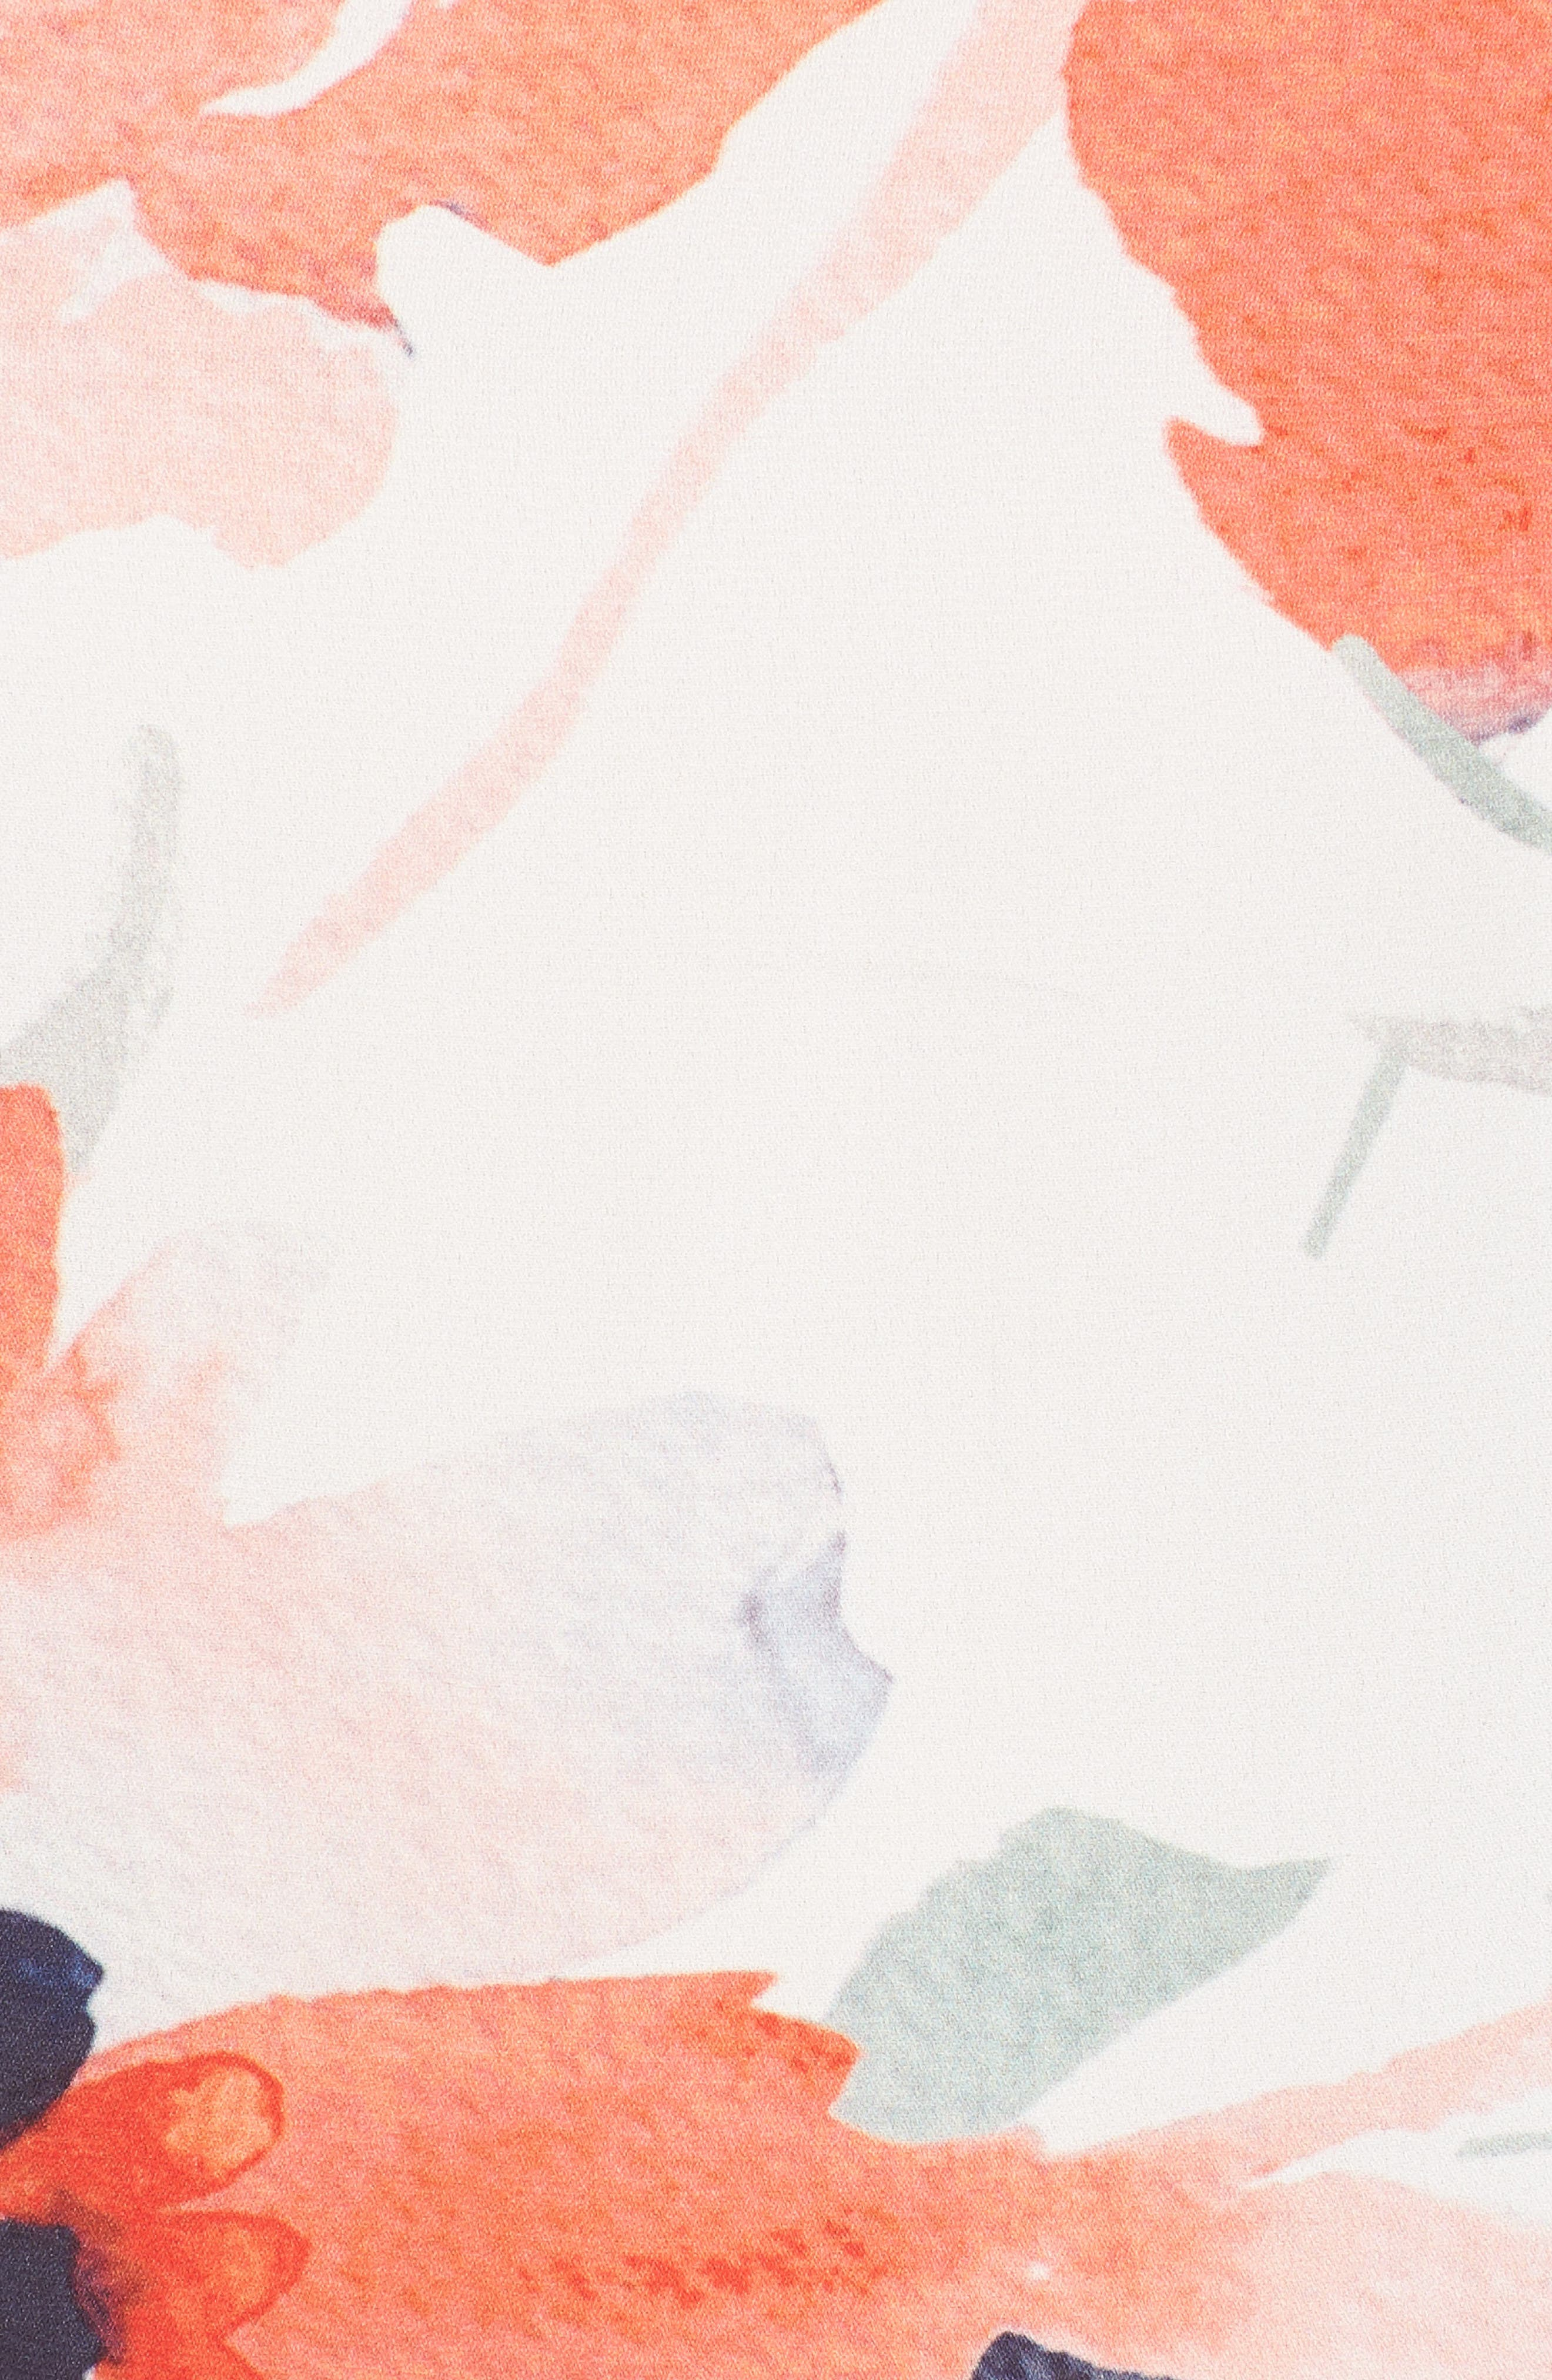 Bishop + Young Ava Cold Shoulder Top,                             Alternate thumbnail 5, color,                             Print